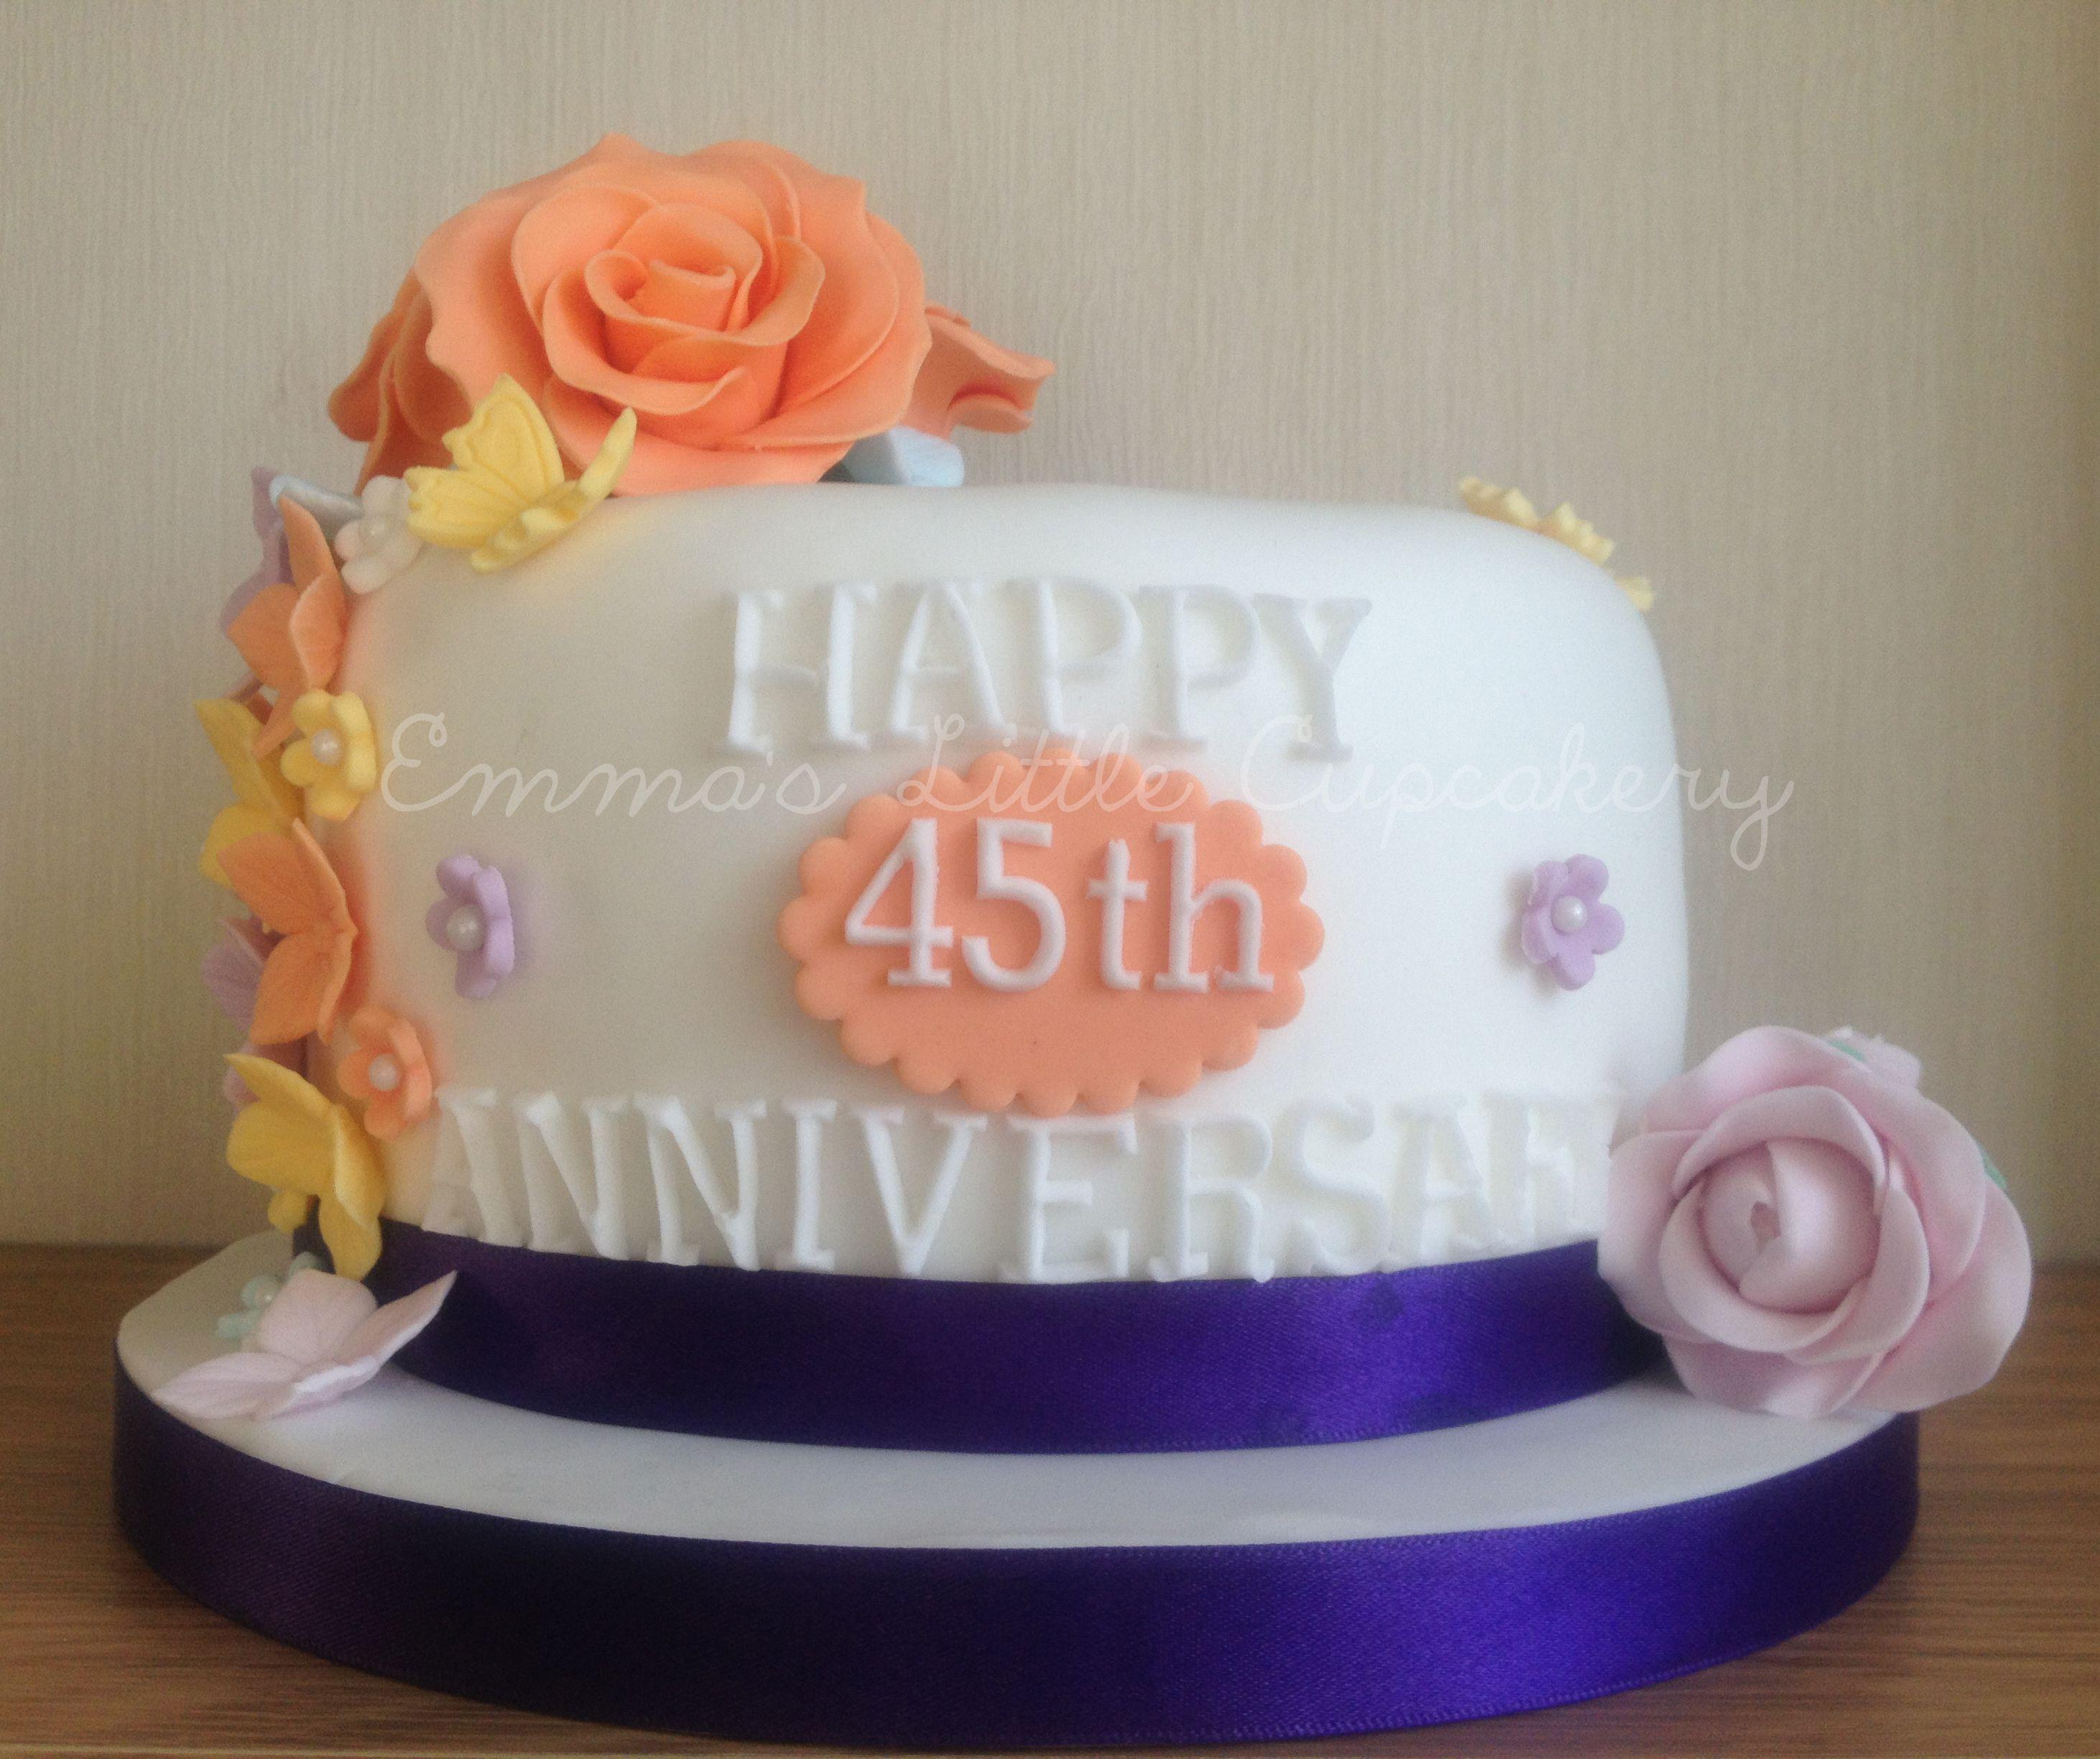 Cake Ideas For 45th Wedding Anniversary : 45th Sapphire Wedding Anniversary Cake Party Planning ...